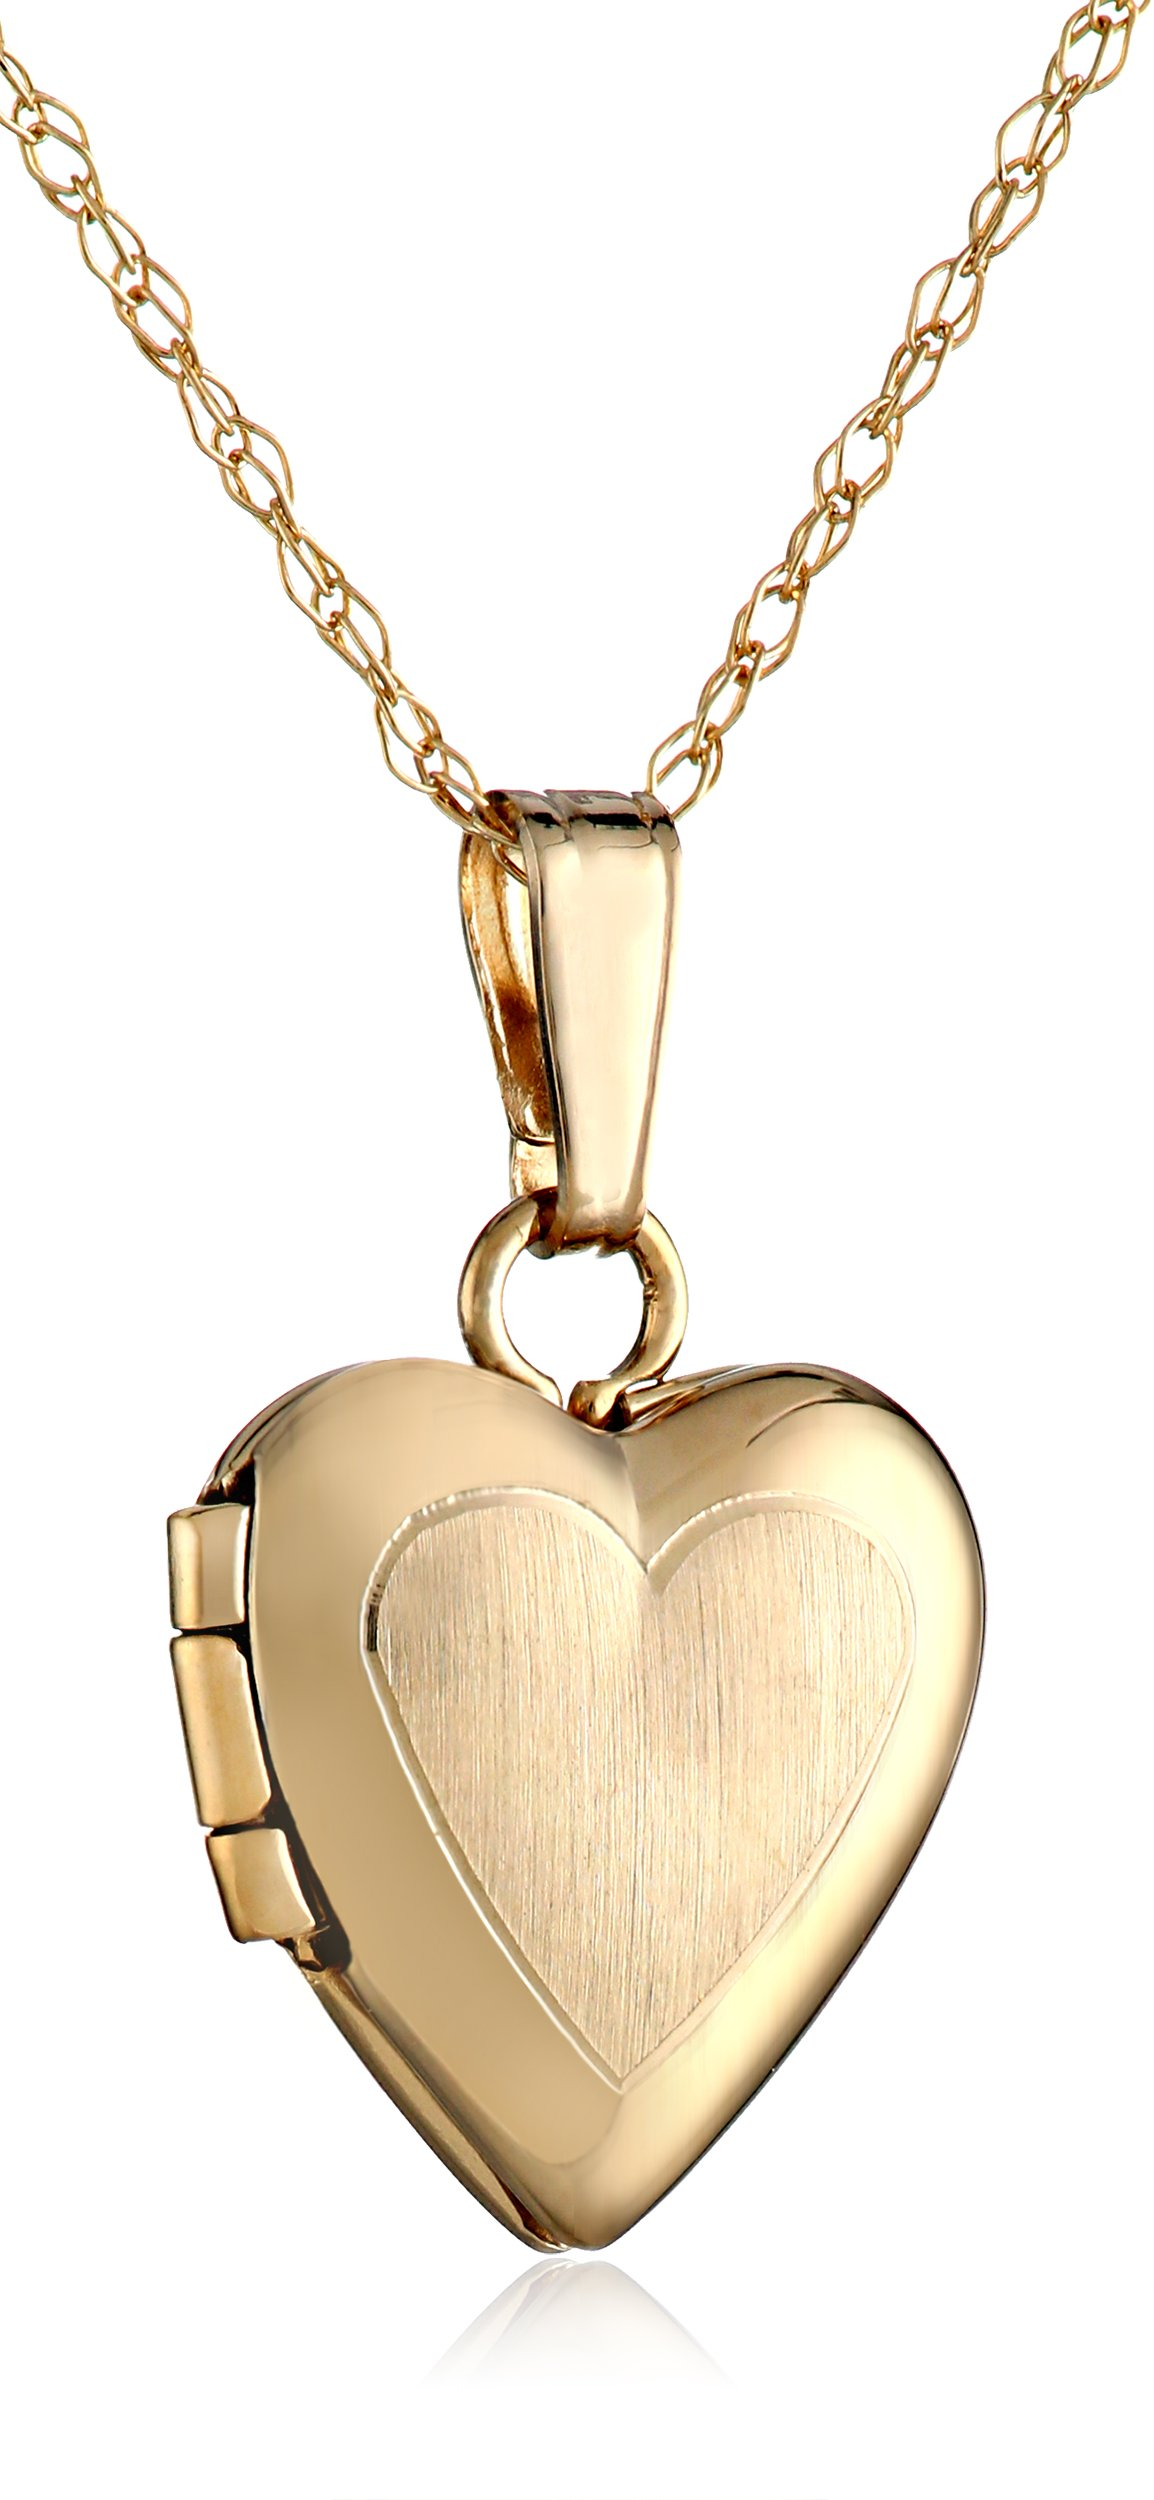 Girls' 14k Yellow Gold Heart Locket Pendant Necklace, 13''